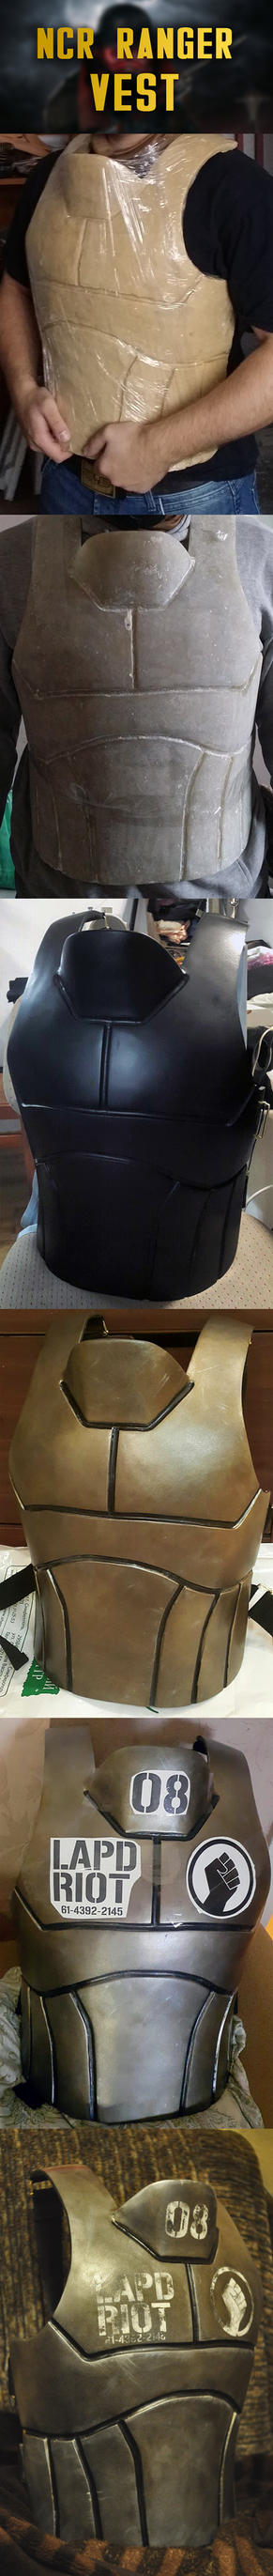 NCR Ranger vest by MaxBdn